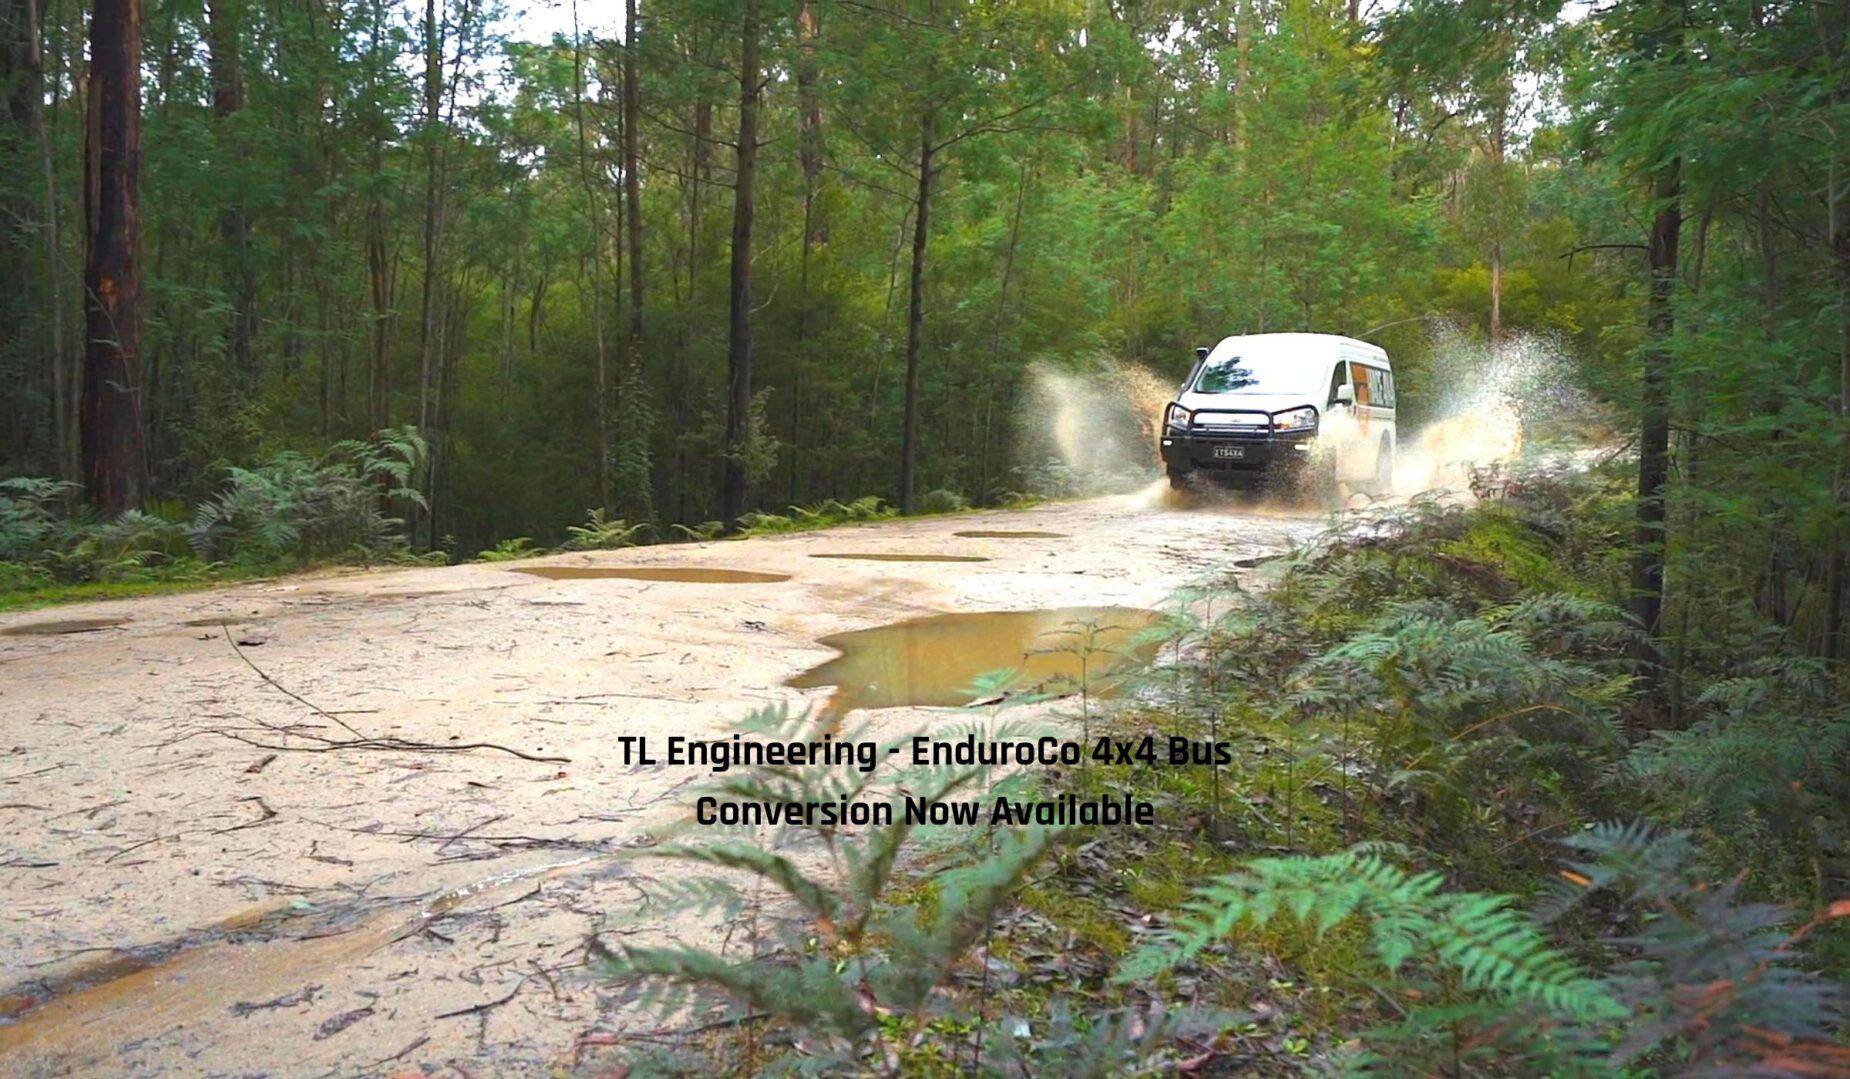 Now buy EnduroCo 4x4 Bus Conversion at TL Engineering Perth WA